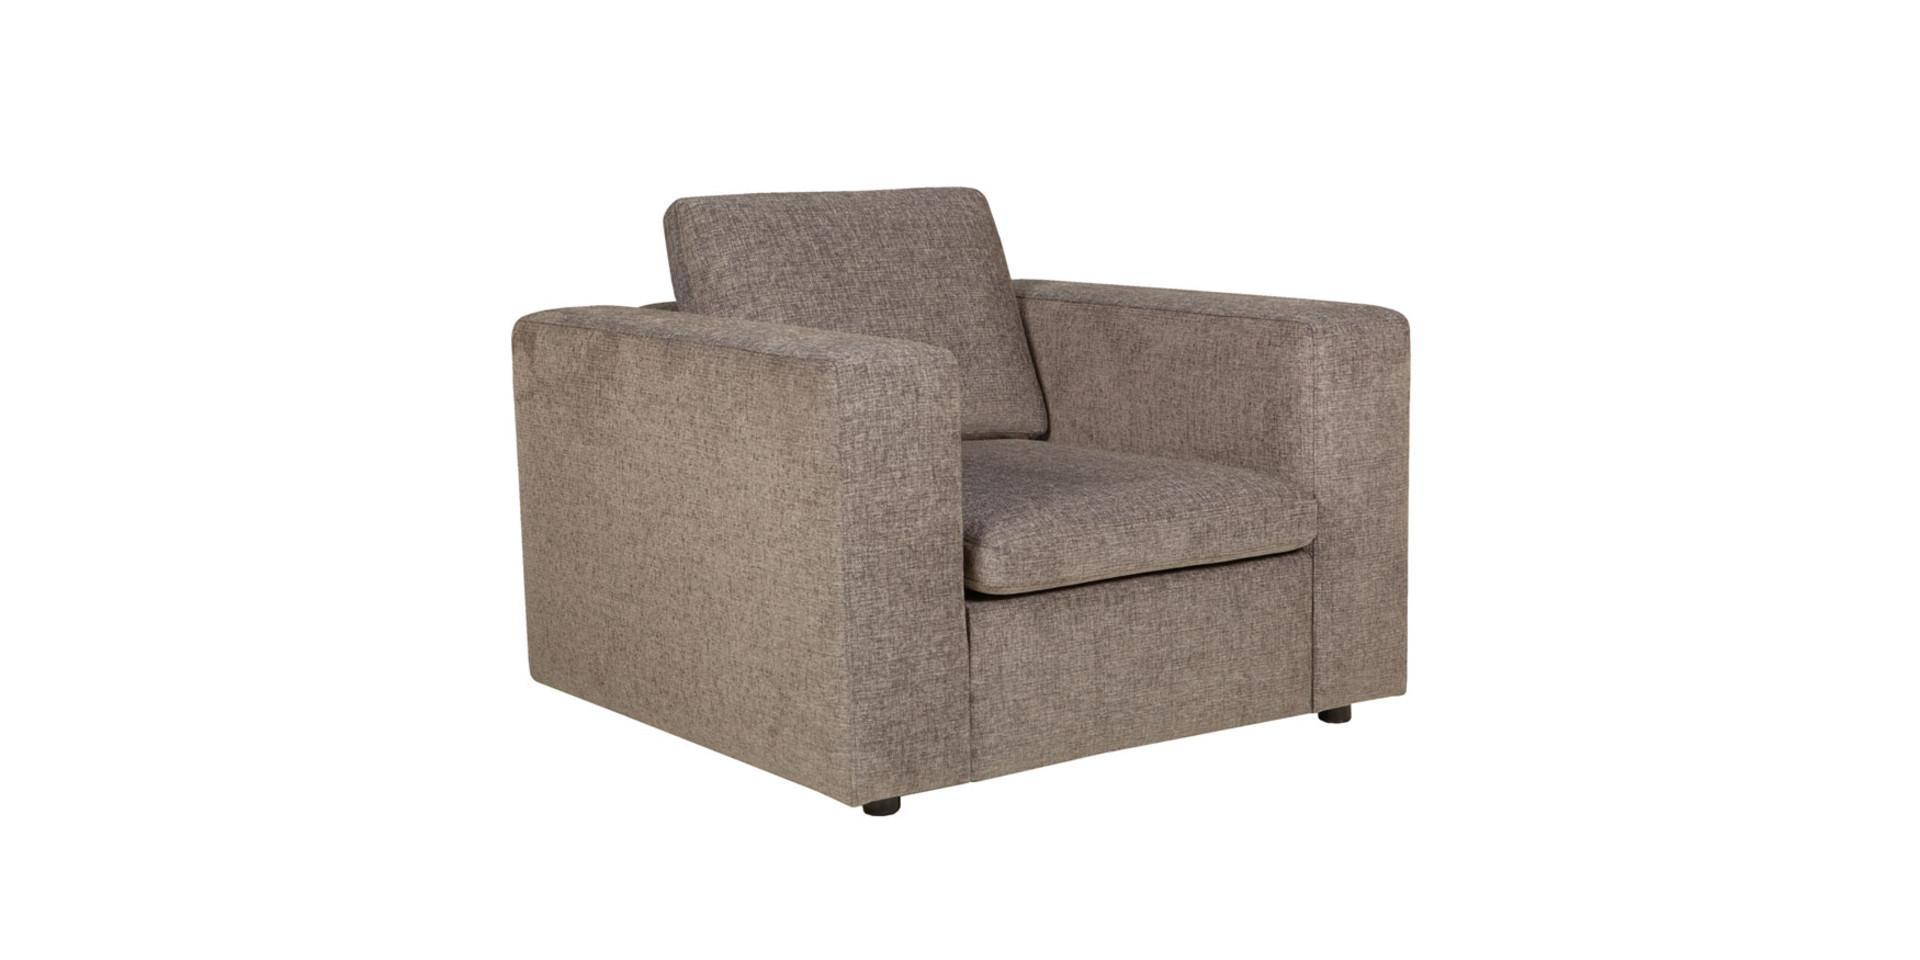 sits-vario-fauteuil-armchair_divine70_grey_2_0